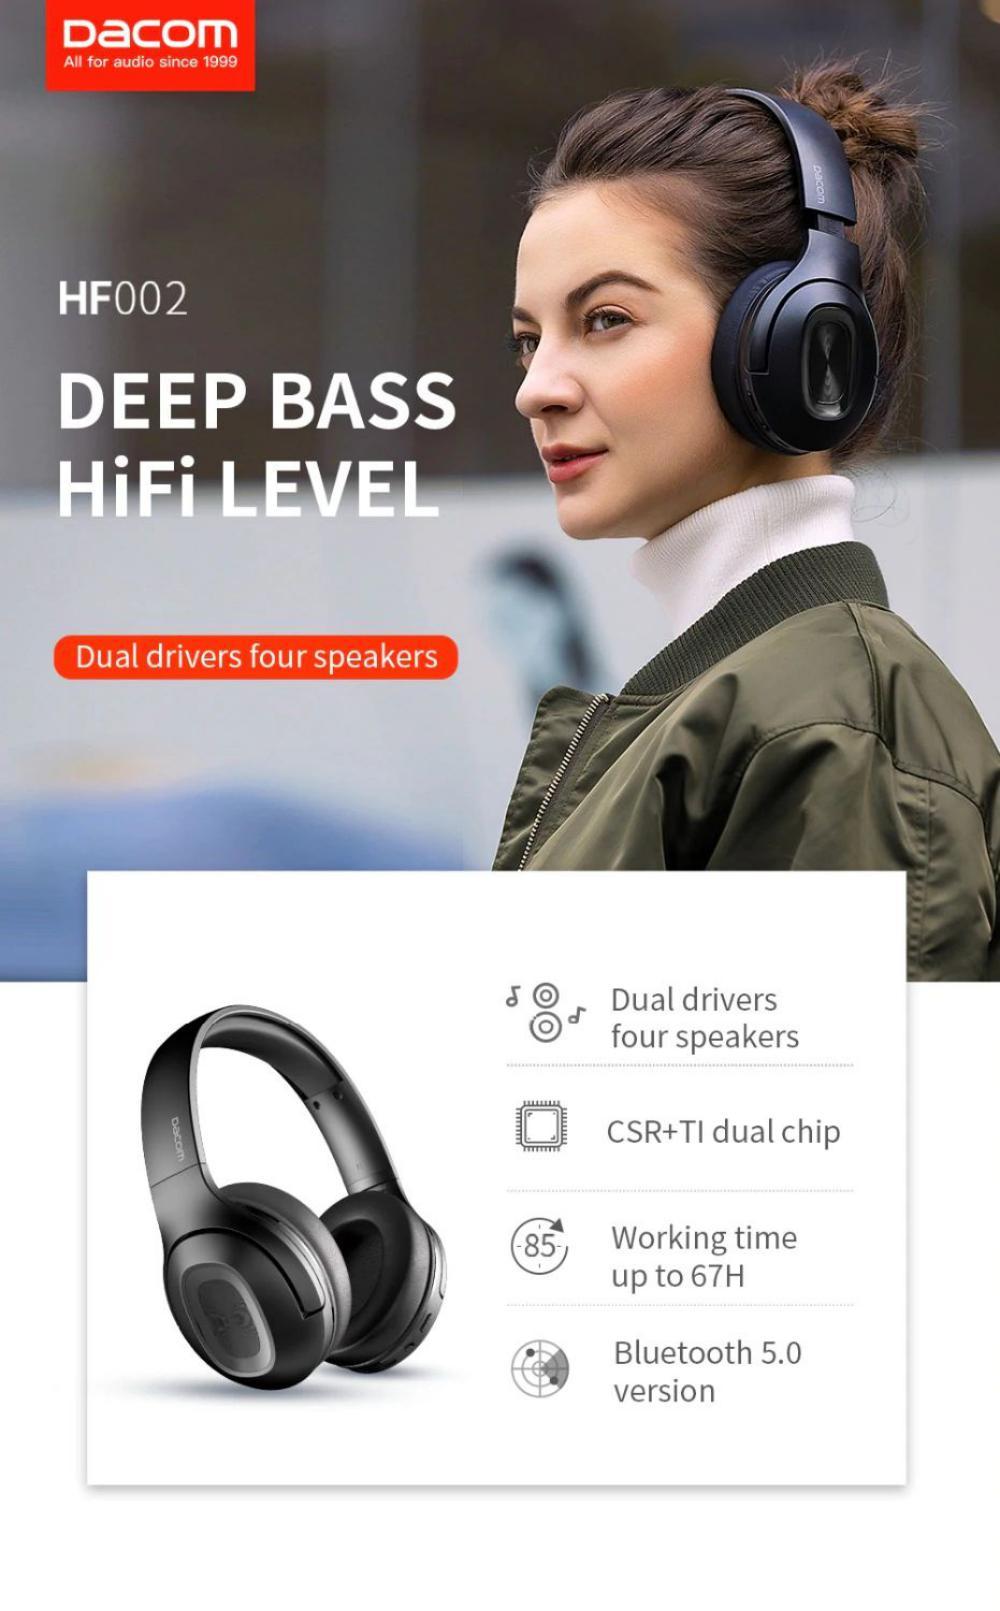 Dacom Hf002 Bluetooth Wireless Headphones (1)